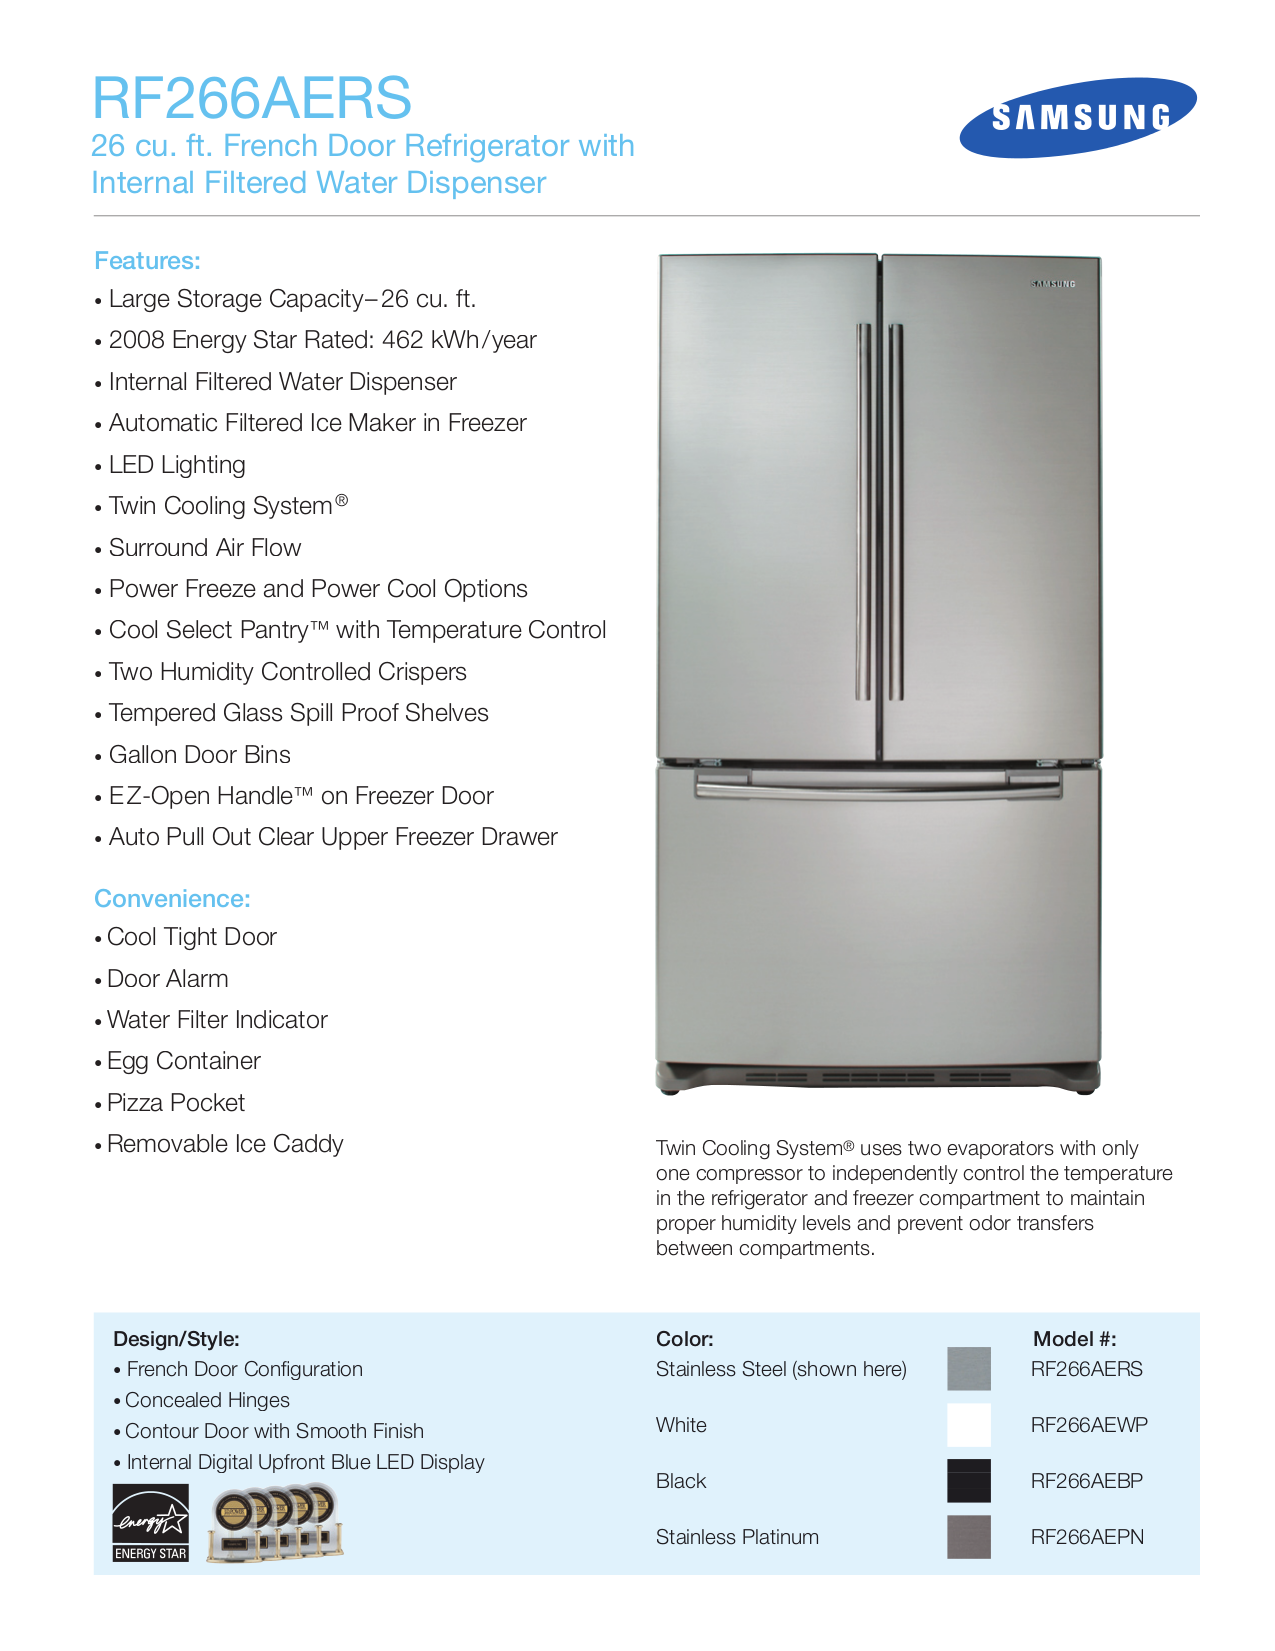 samsung rf266 refrigerator manual image refrigerator nabateans org rh nabateans org samsung refrigerator manual rf260beaesr samsung refrigerator manual rf263beaesg